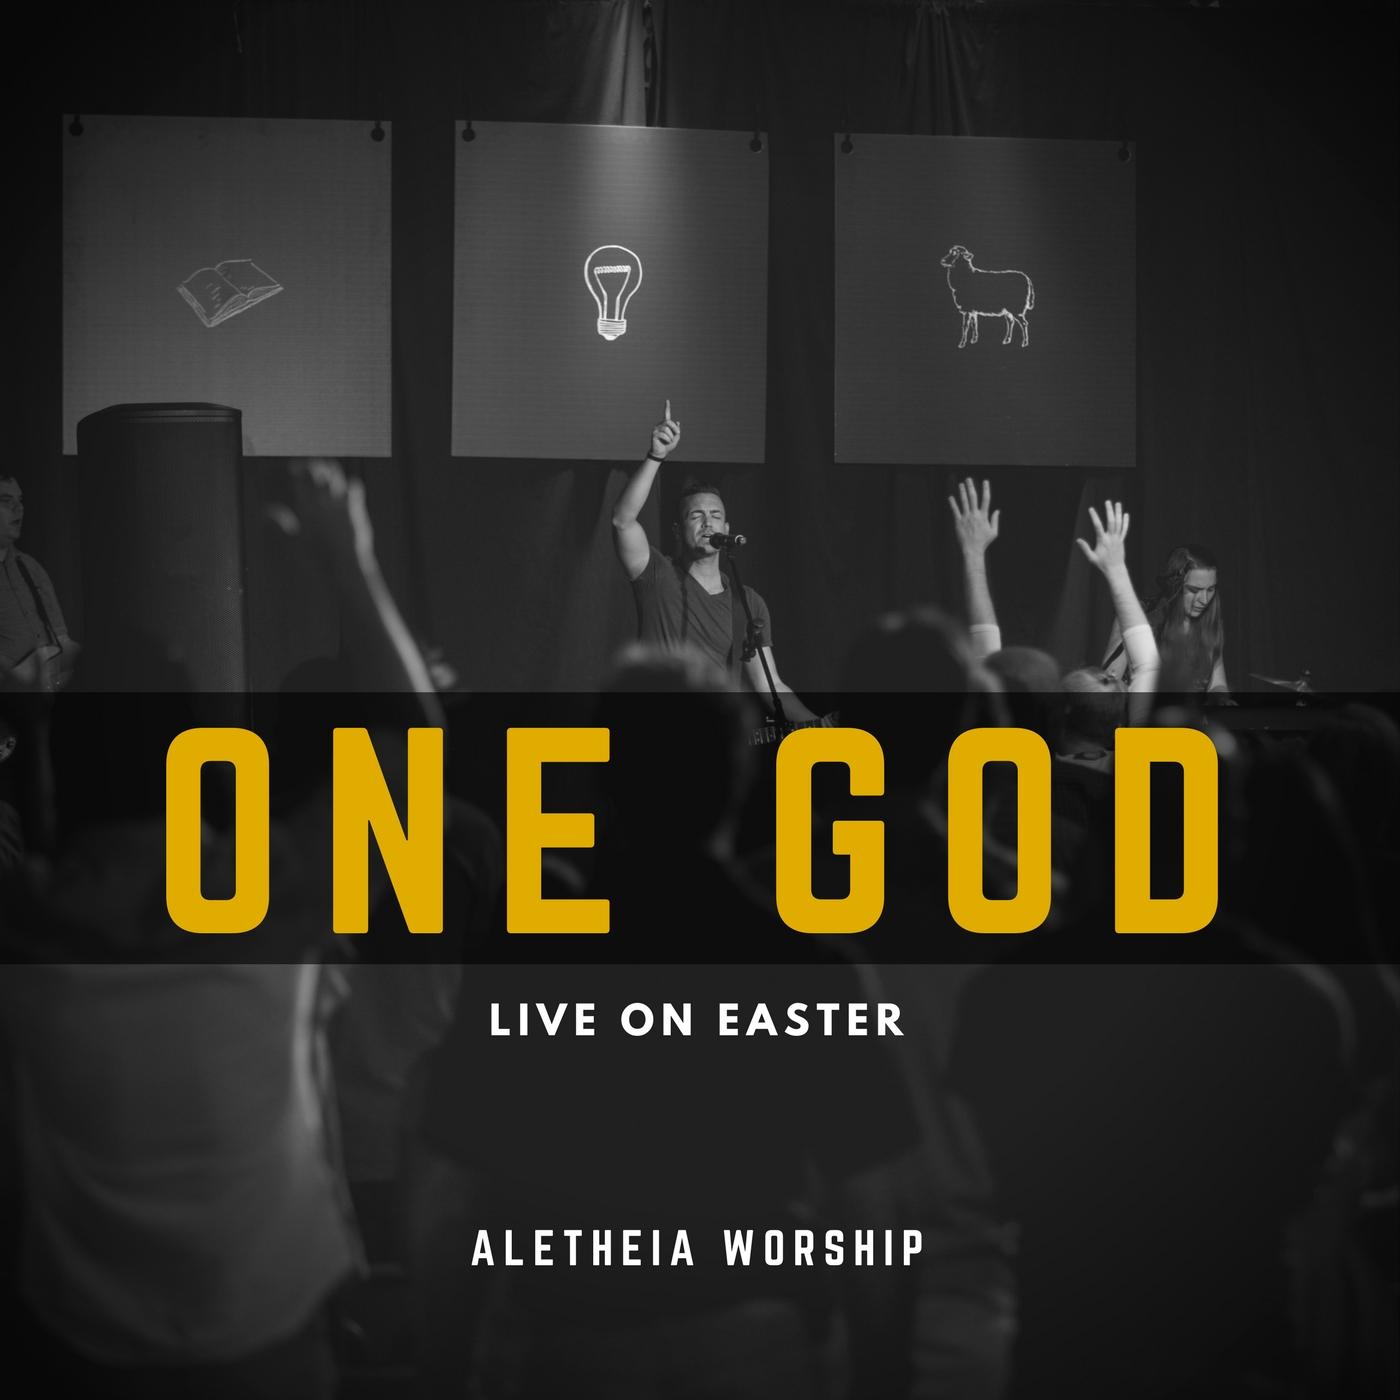 One God: Live On Easter (2016)